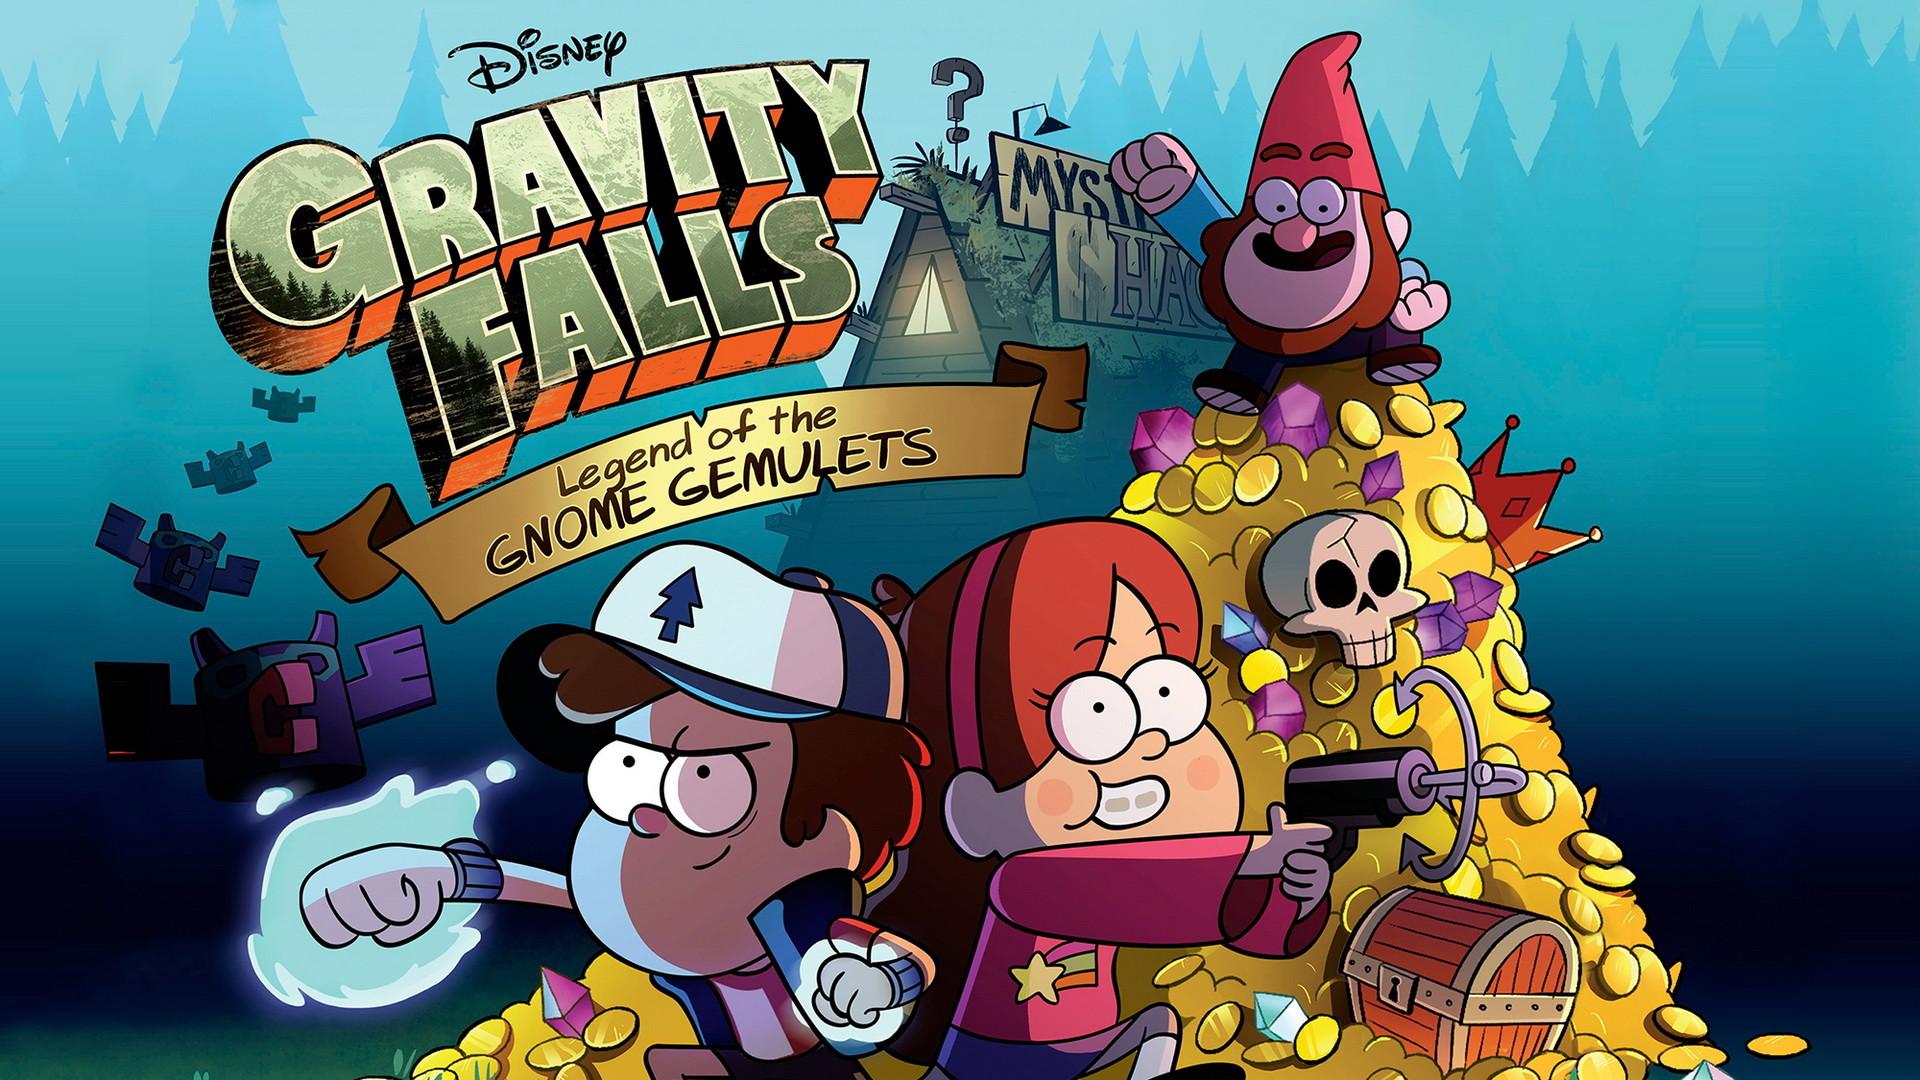 Gravity Falls – Legend of Gnome Gemulets